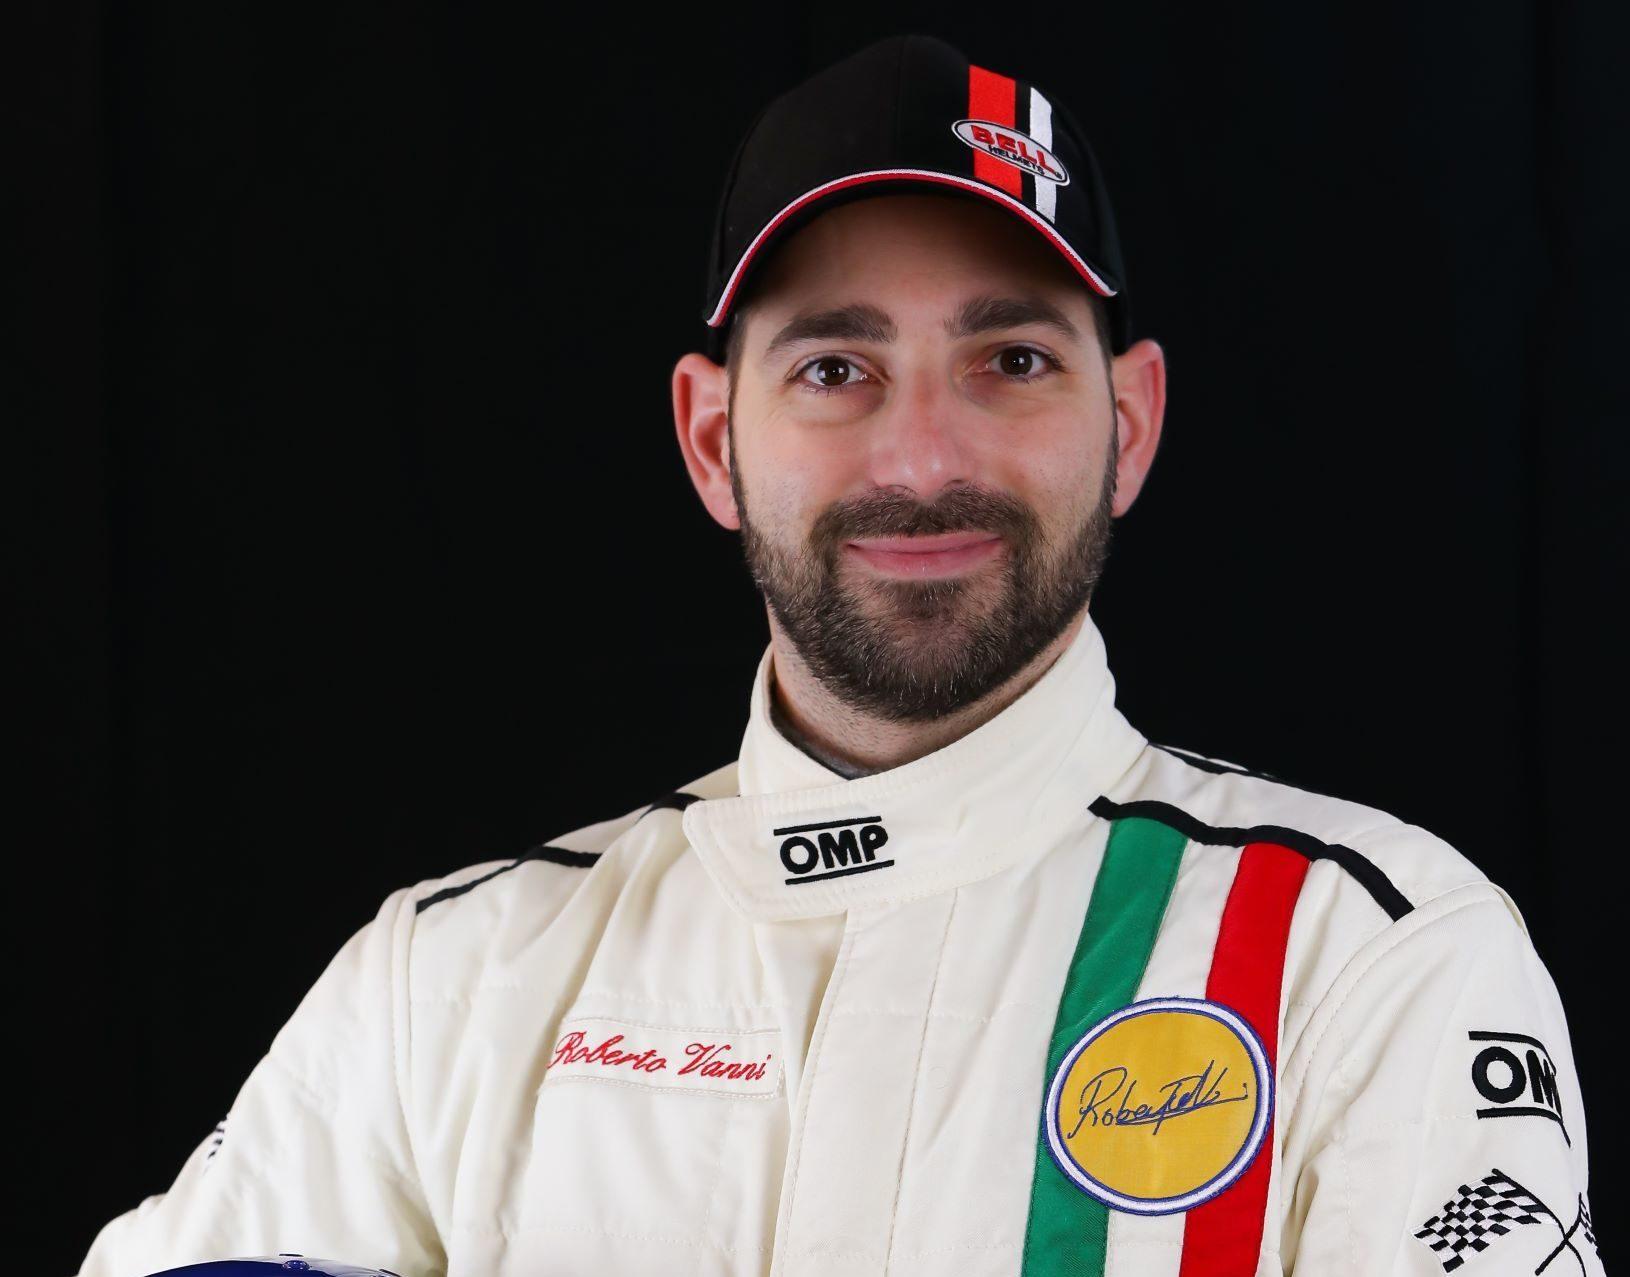 Roberto Vanni